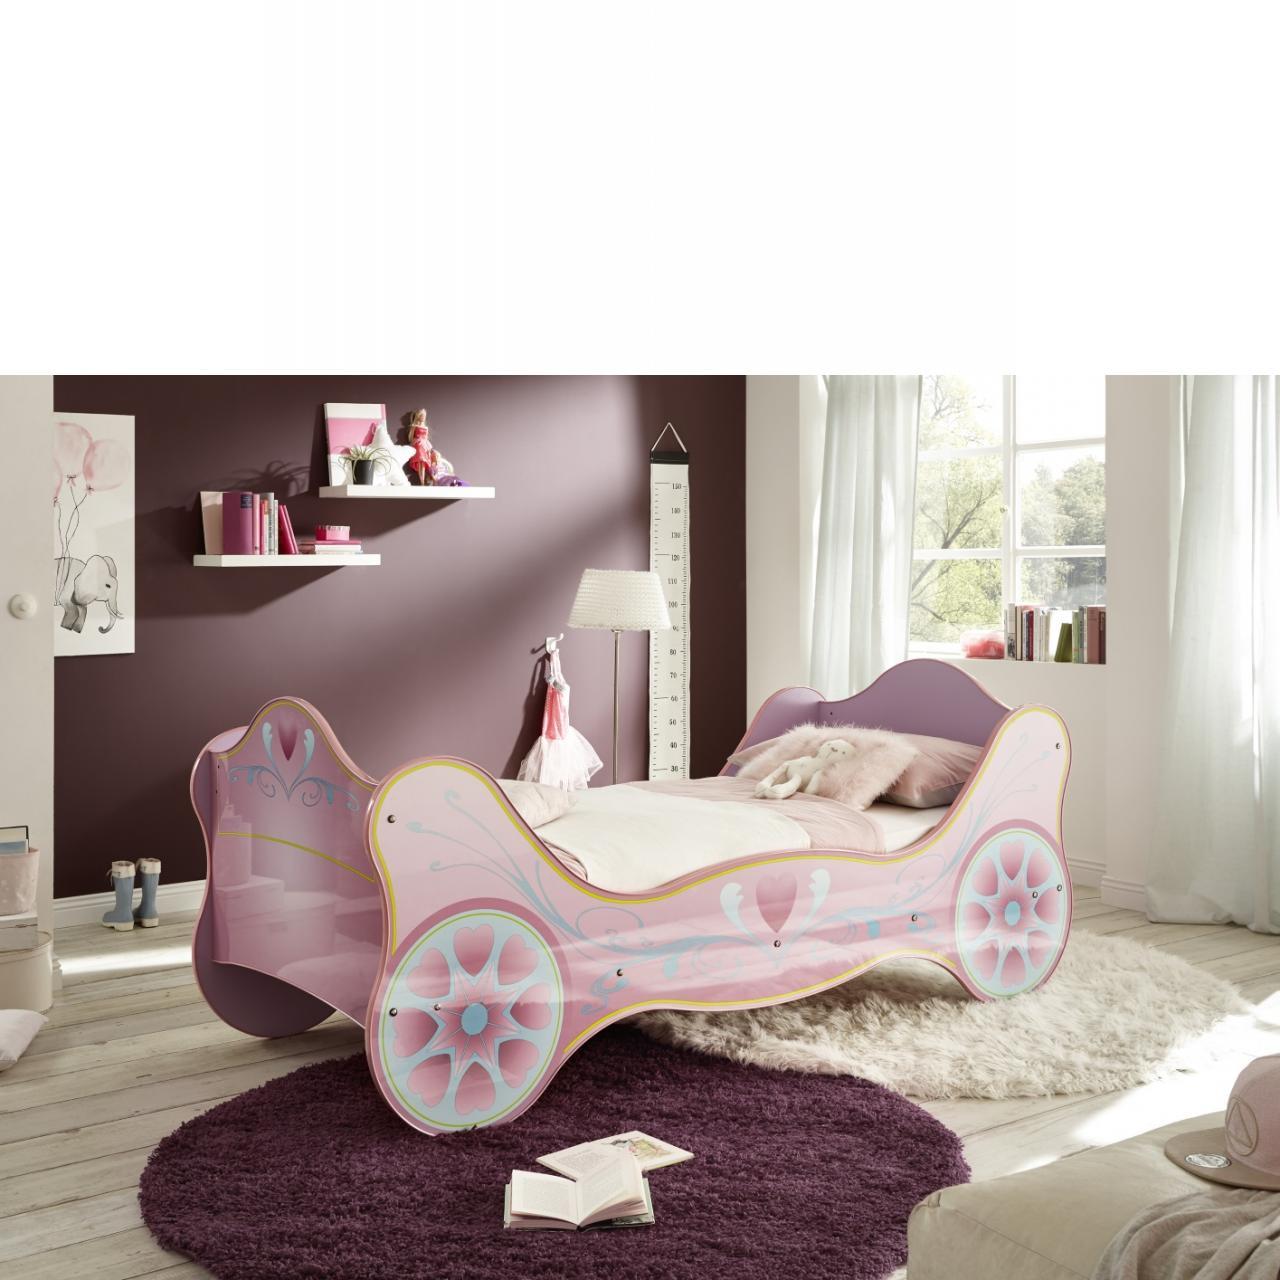 Full Size of Kinderbett Sissy Lila 90x200 Cm Kinderzimmer Auto Mdchen Bett Mädchen Betten Wohnzimmer Kinderbett Mädchen